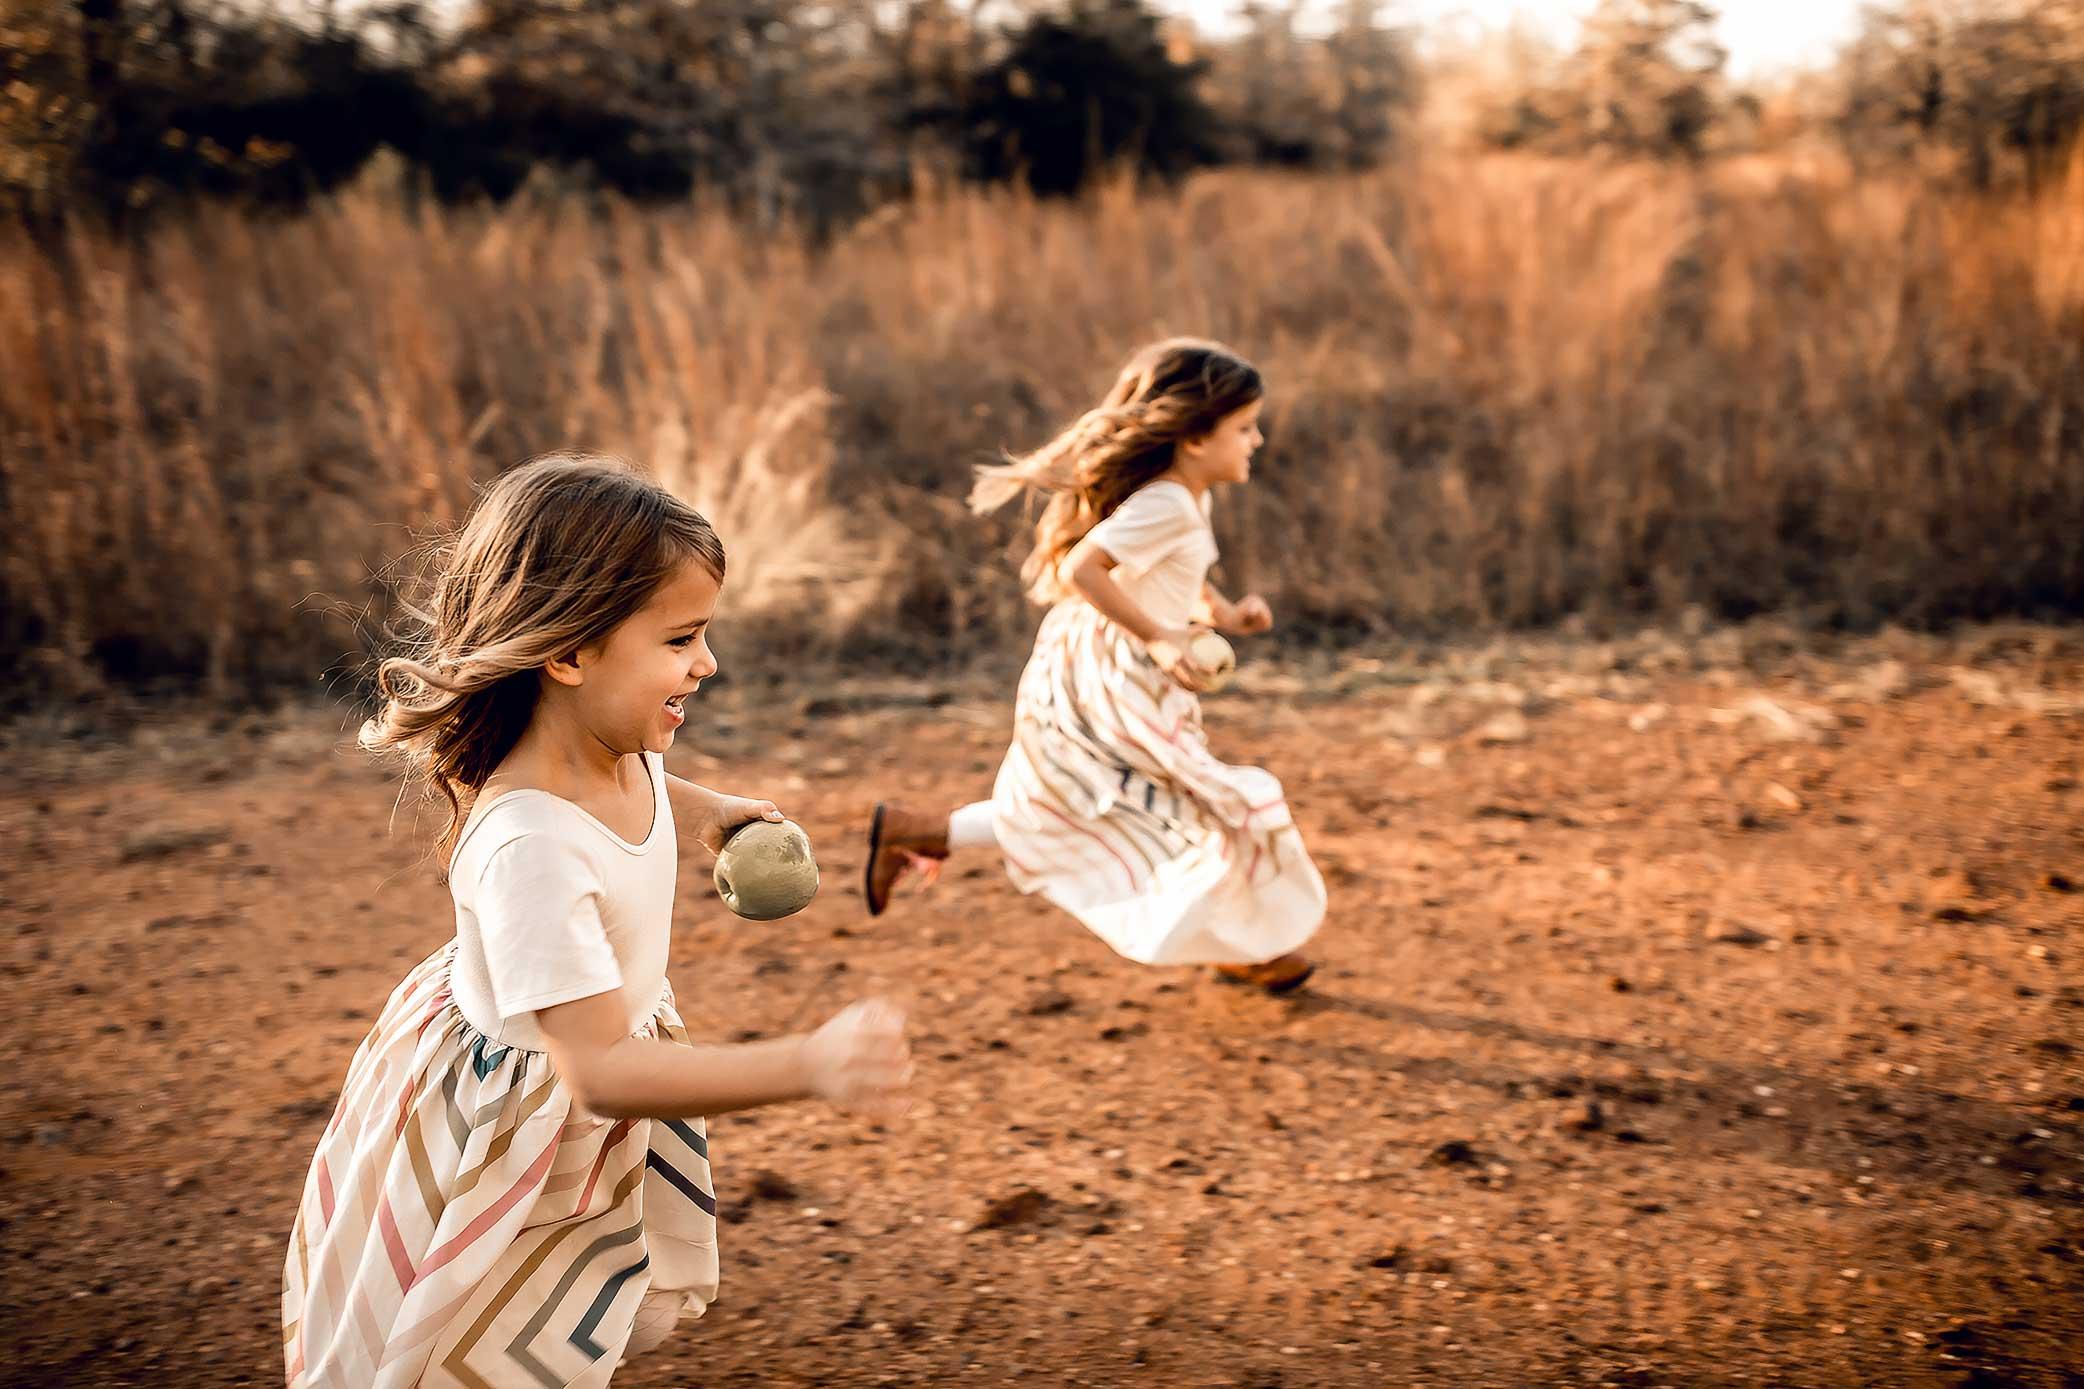 shelby-schiller-photography-family-twins-running-in-linen-dresses.jpg